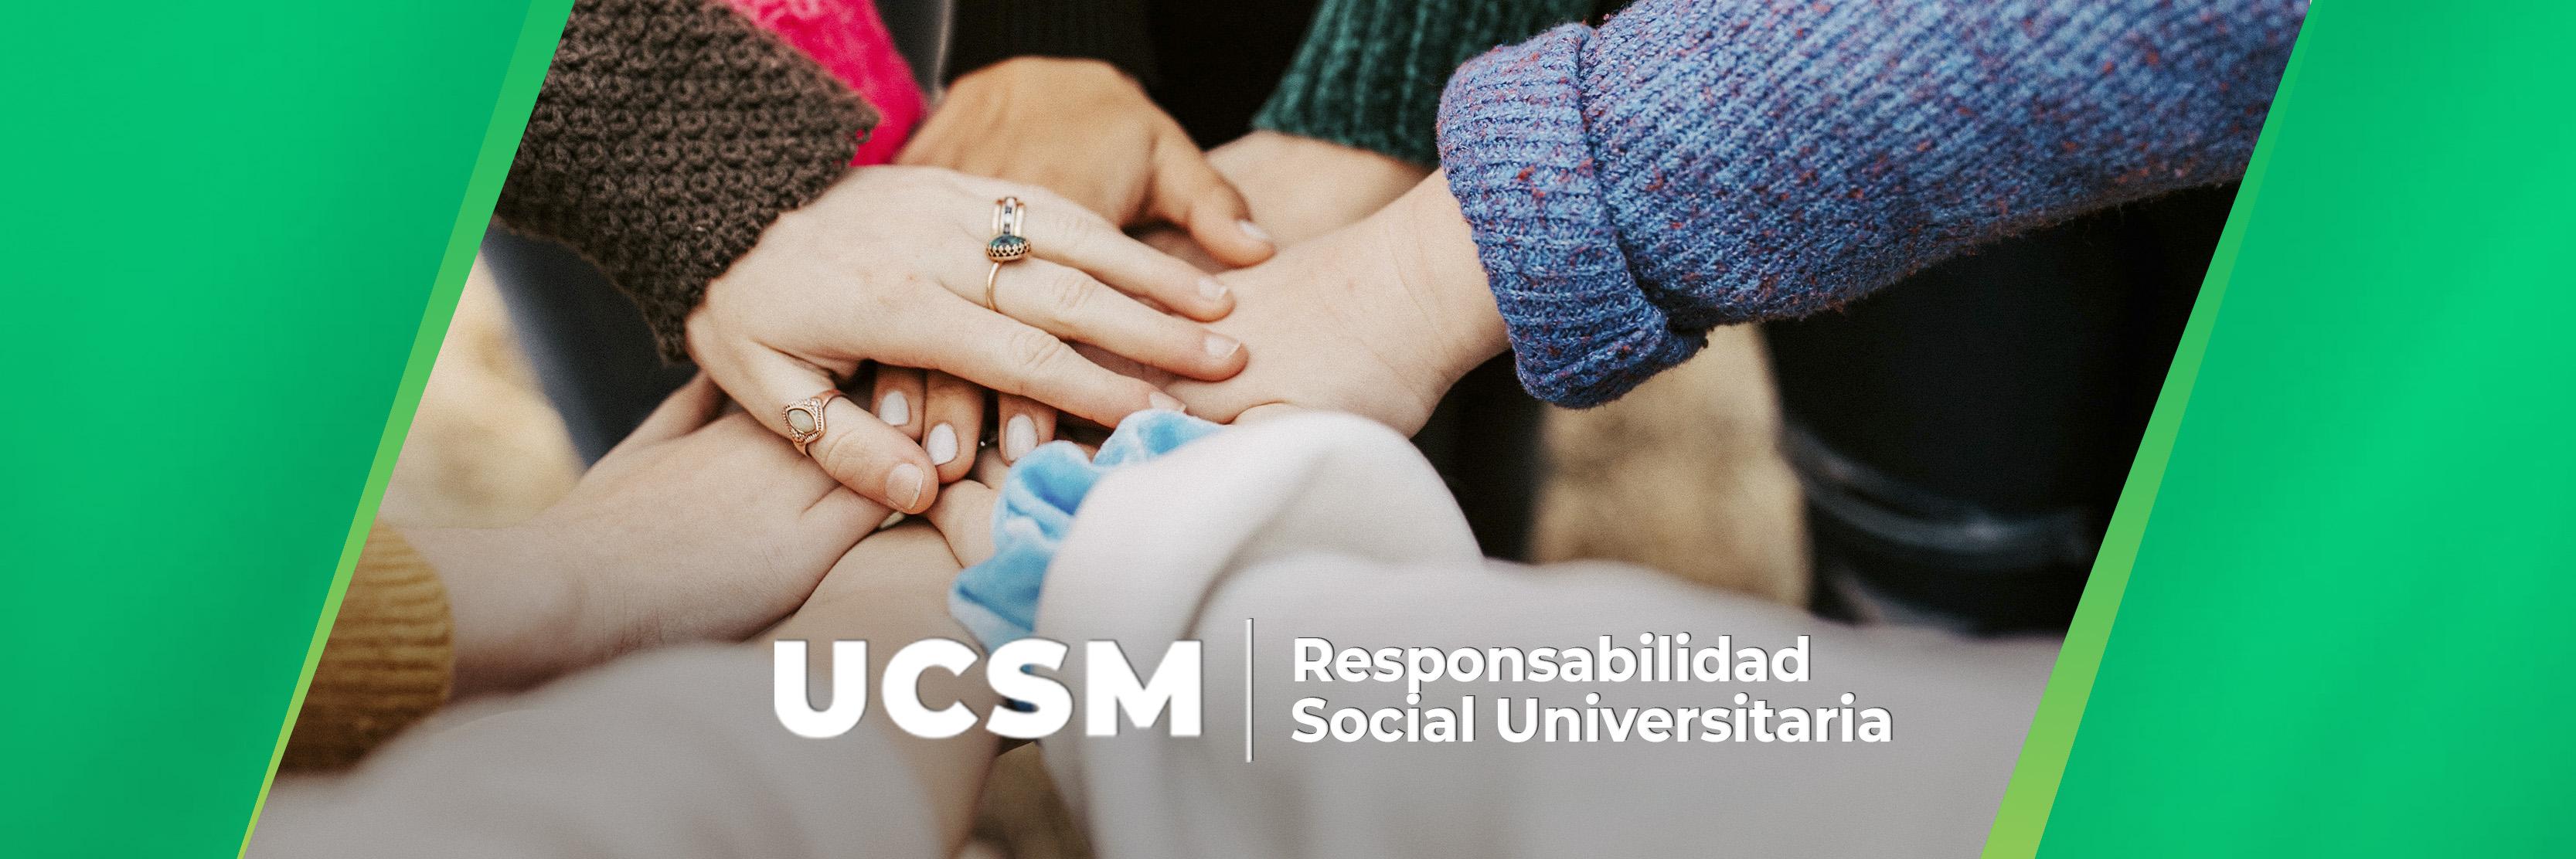 responsabilidad-social-universitaria